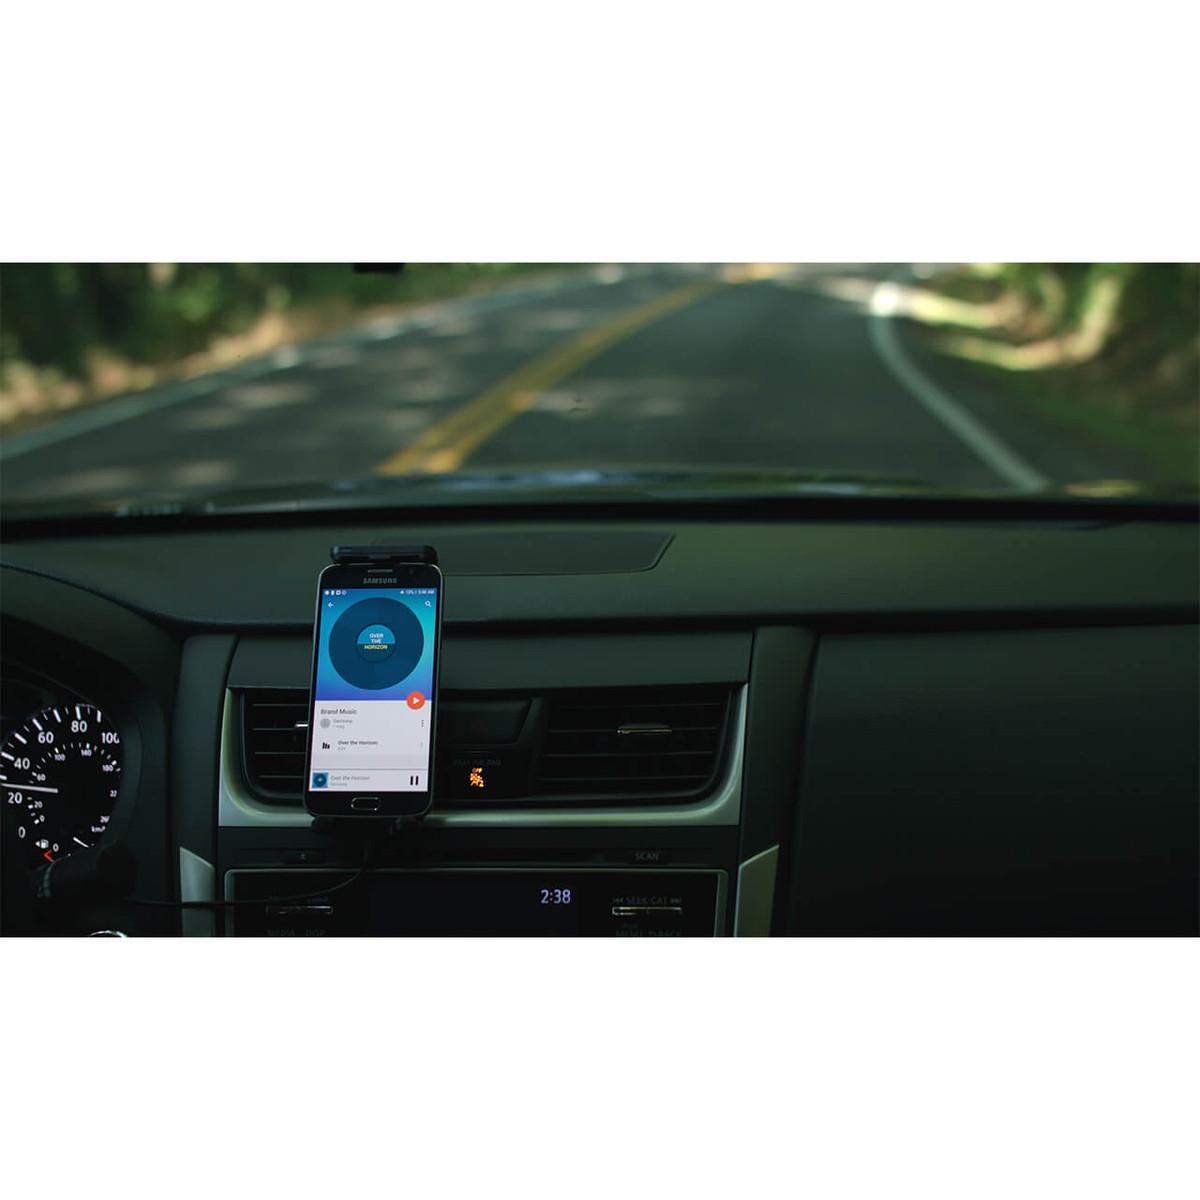 weBoost Drive Sleek OTR 4G Cell Phone Booster Kit - 470235F